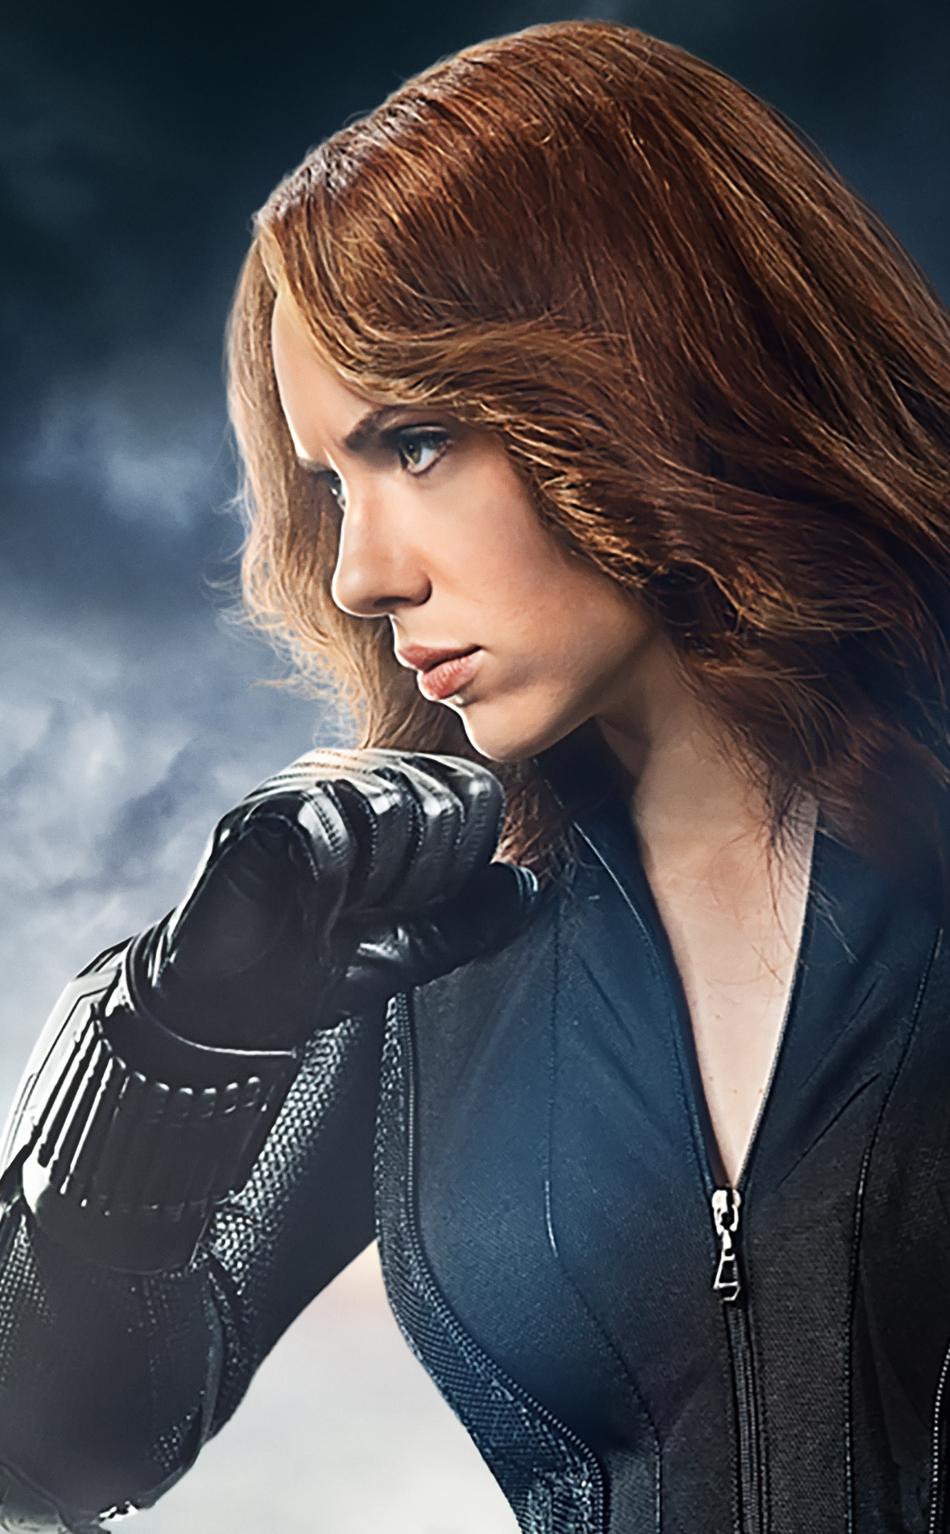 Download 950x1534 Wallpaper Black Widow Red Head Avengers Scarlett Johansson Natasha Iphone 950x1534 Hd Image Background 14822